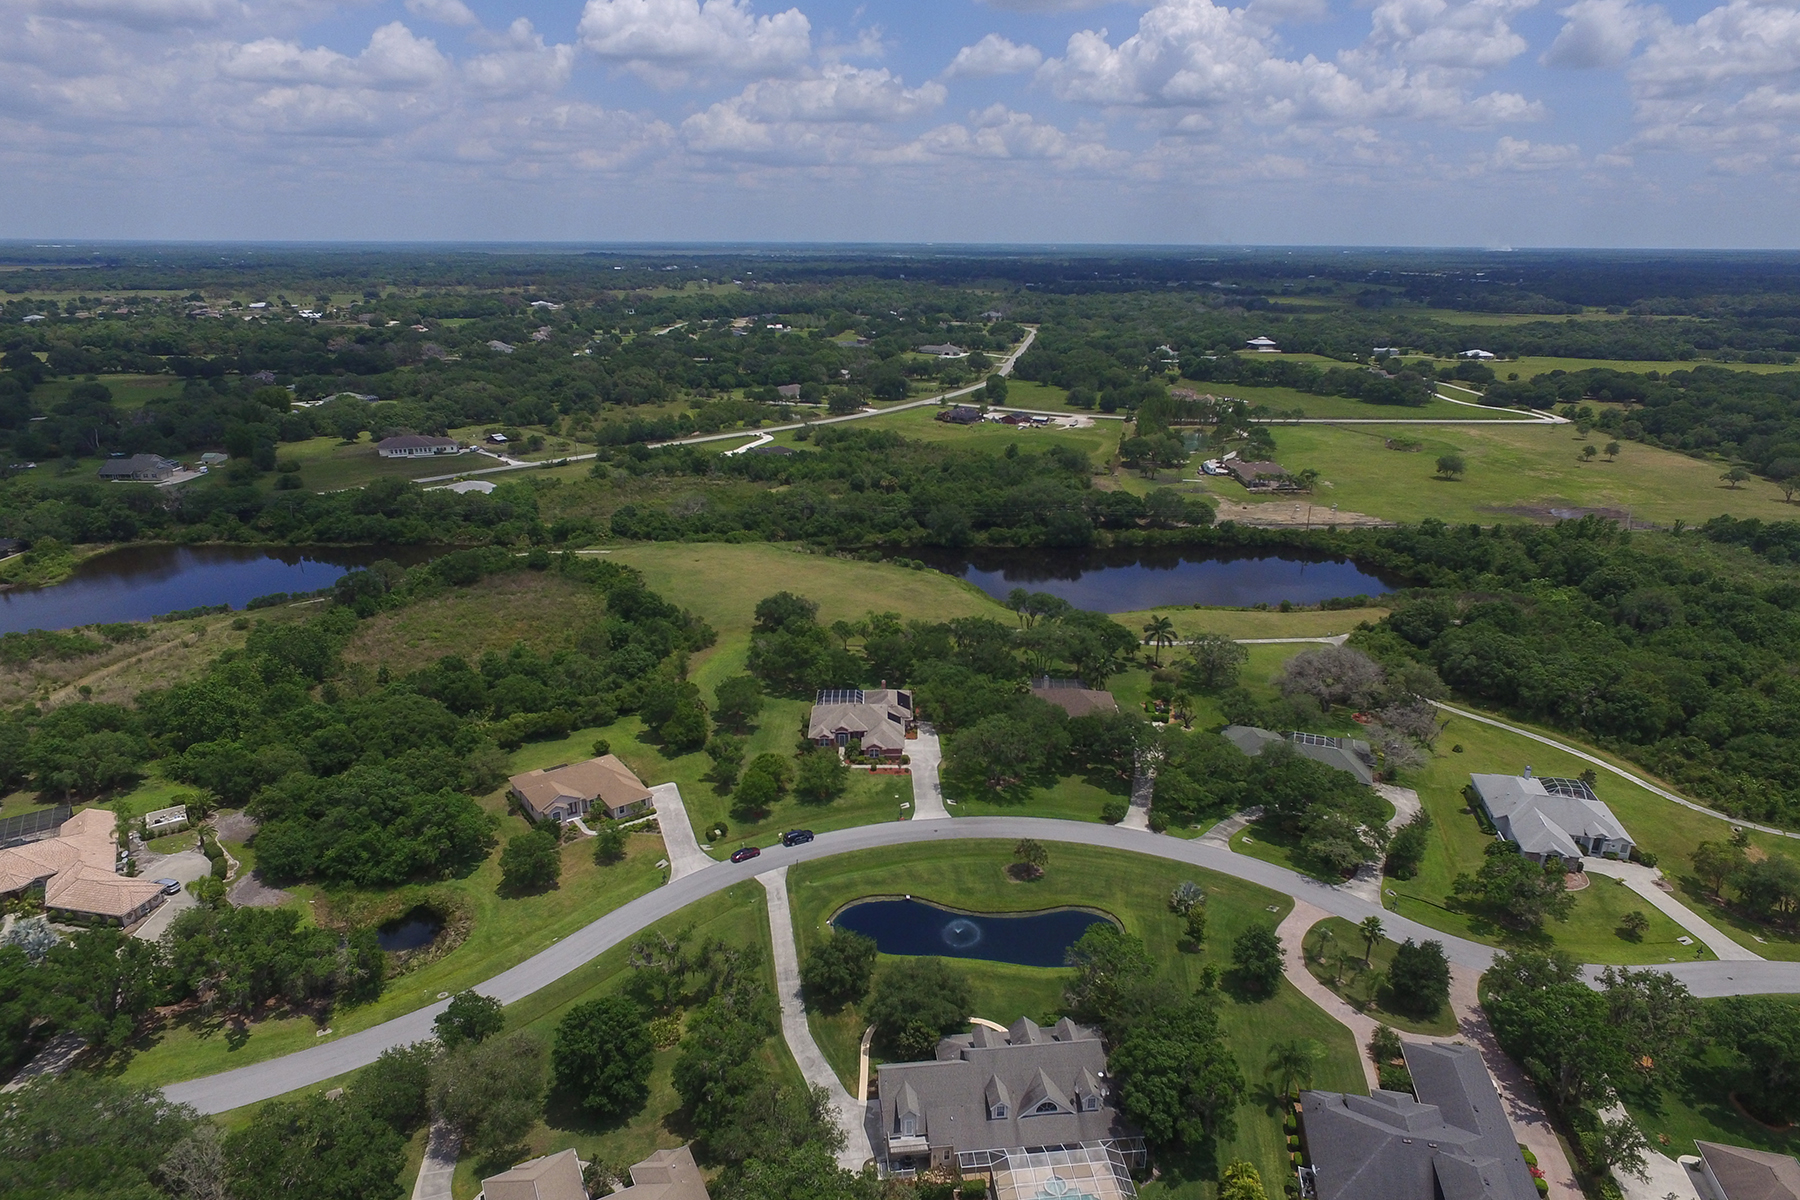 Single Family Home for Sale at OAK FORD GOLF CLUB 1575 Kingsdown Dr Sarasota, Florida, 34240 United States